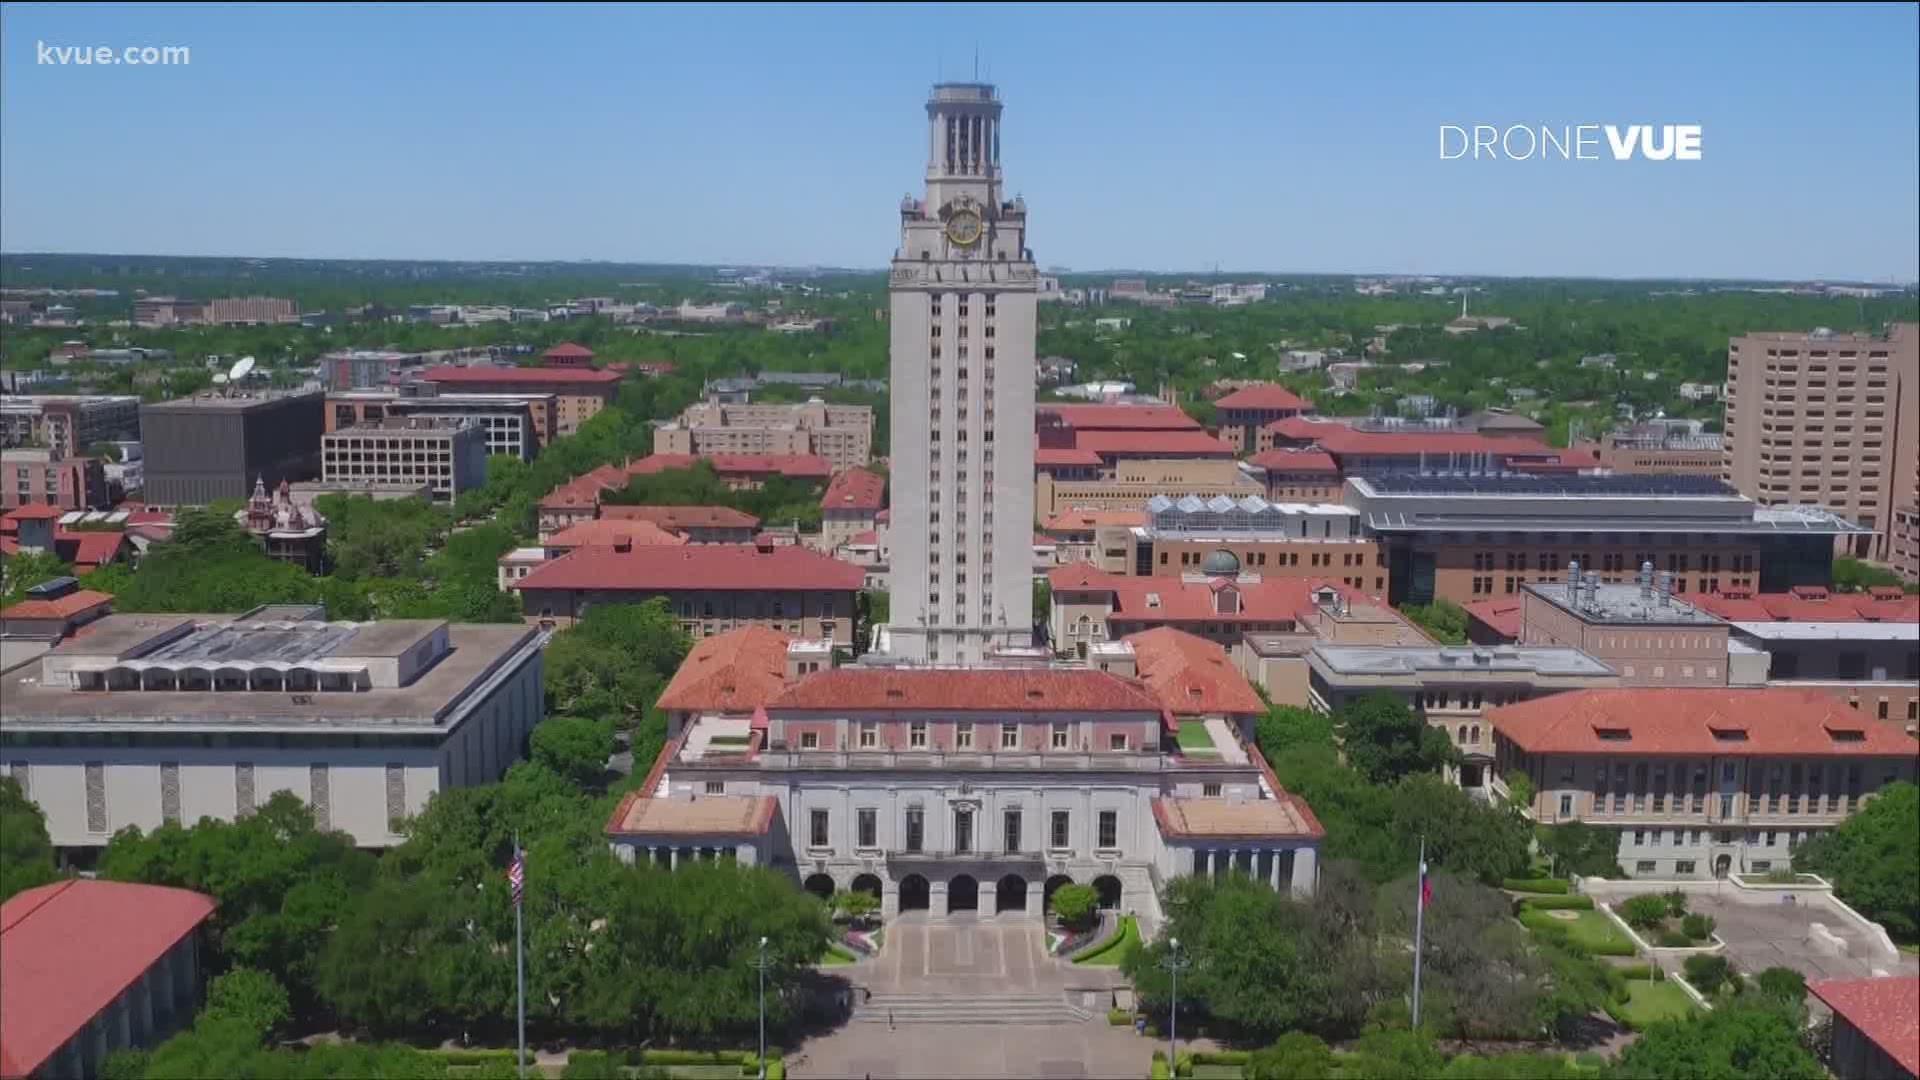 Coronavirus in Texas: Here's COVID-19 stats of UT students, staff   kvue.com